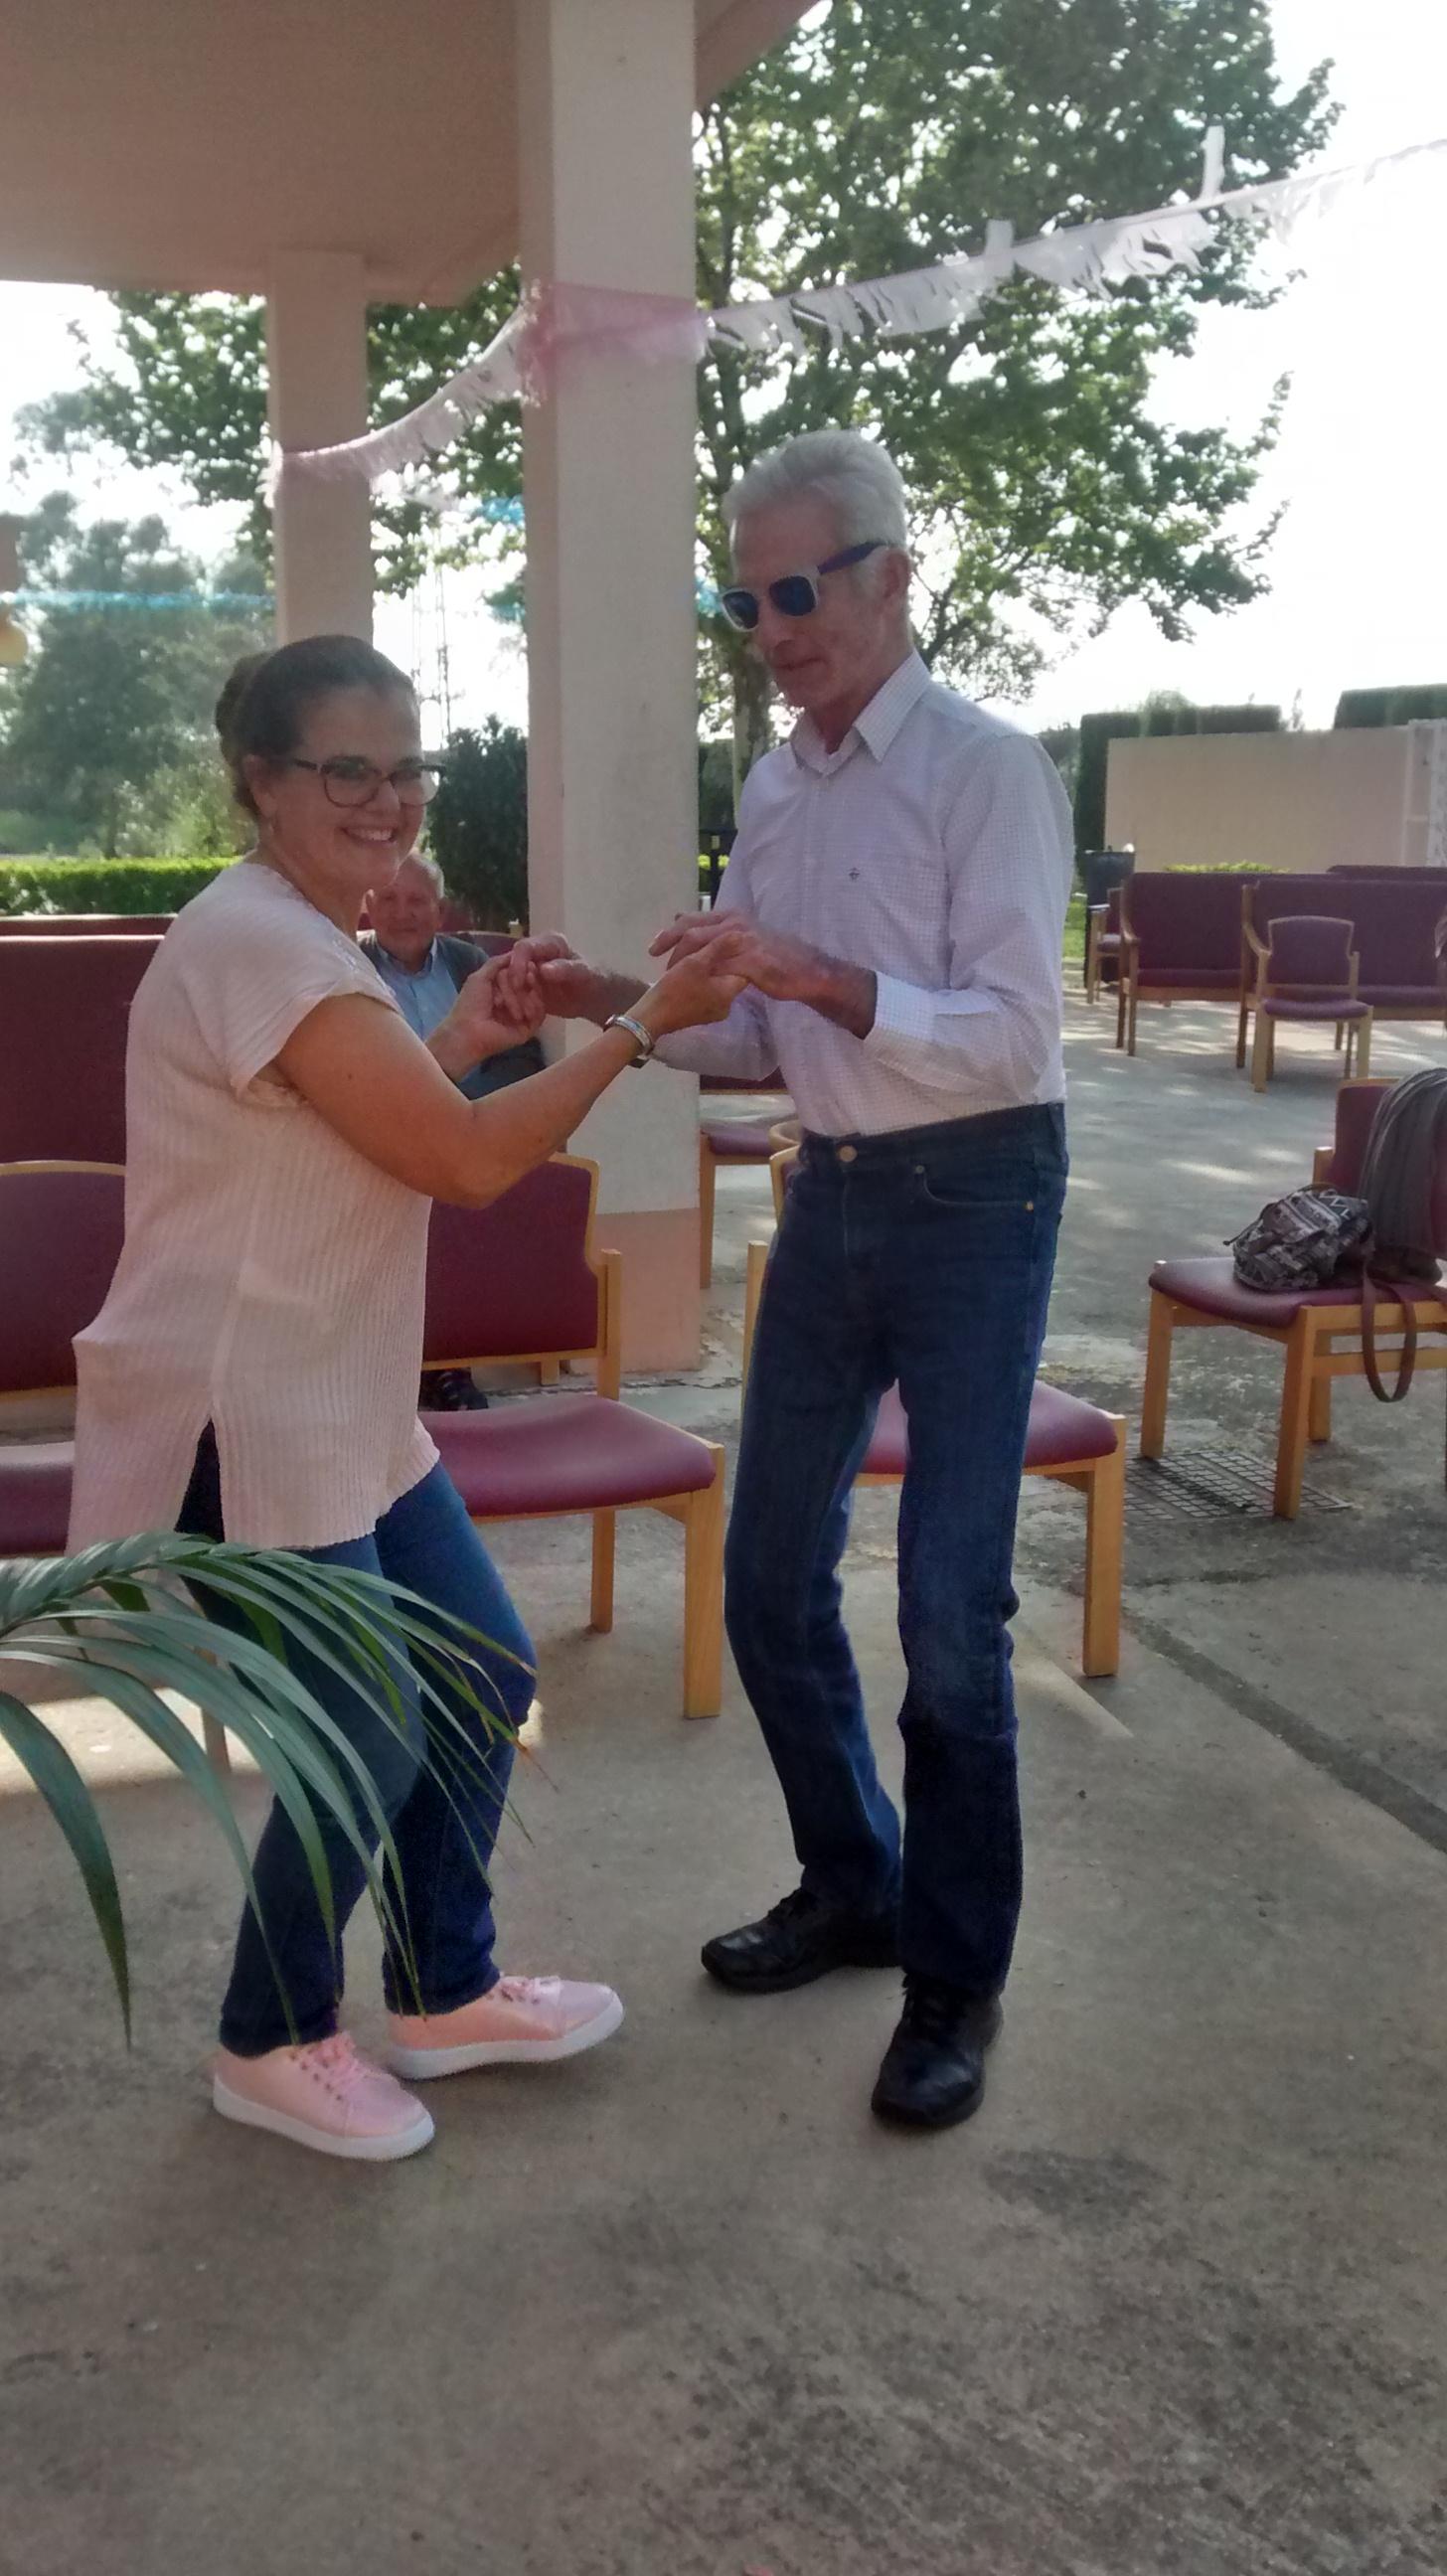 bailando aniversario monte jara tharsis